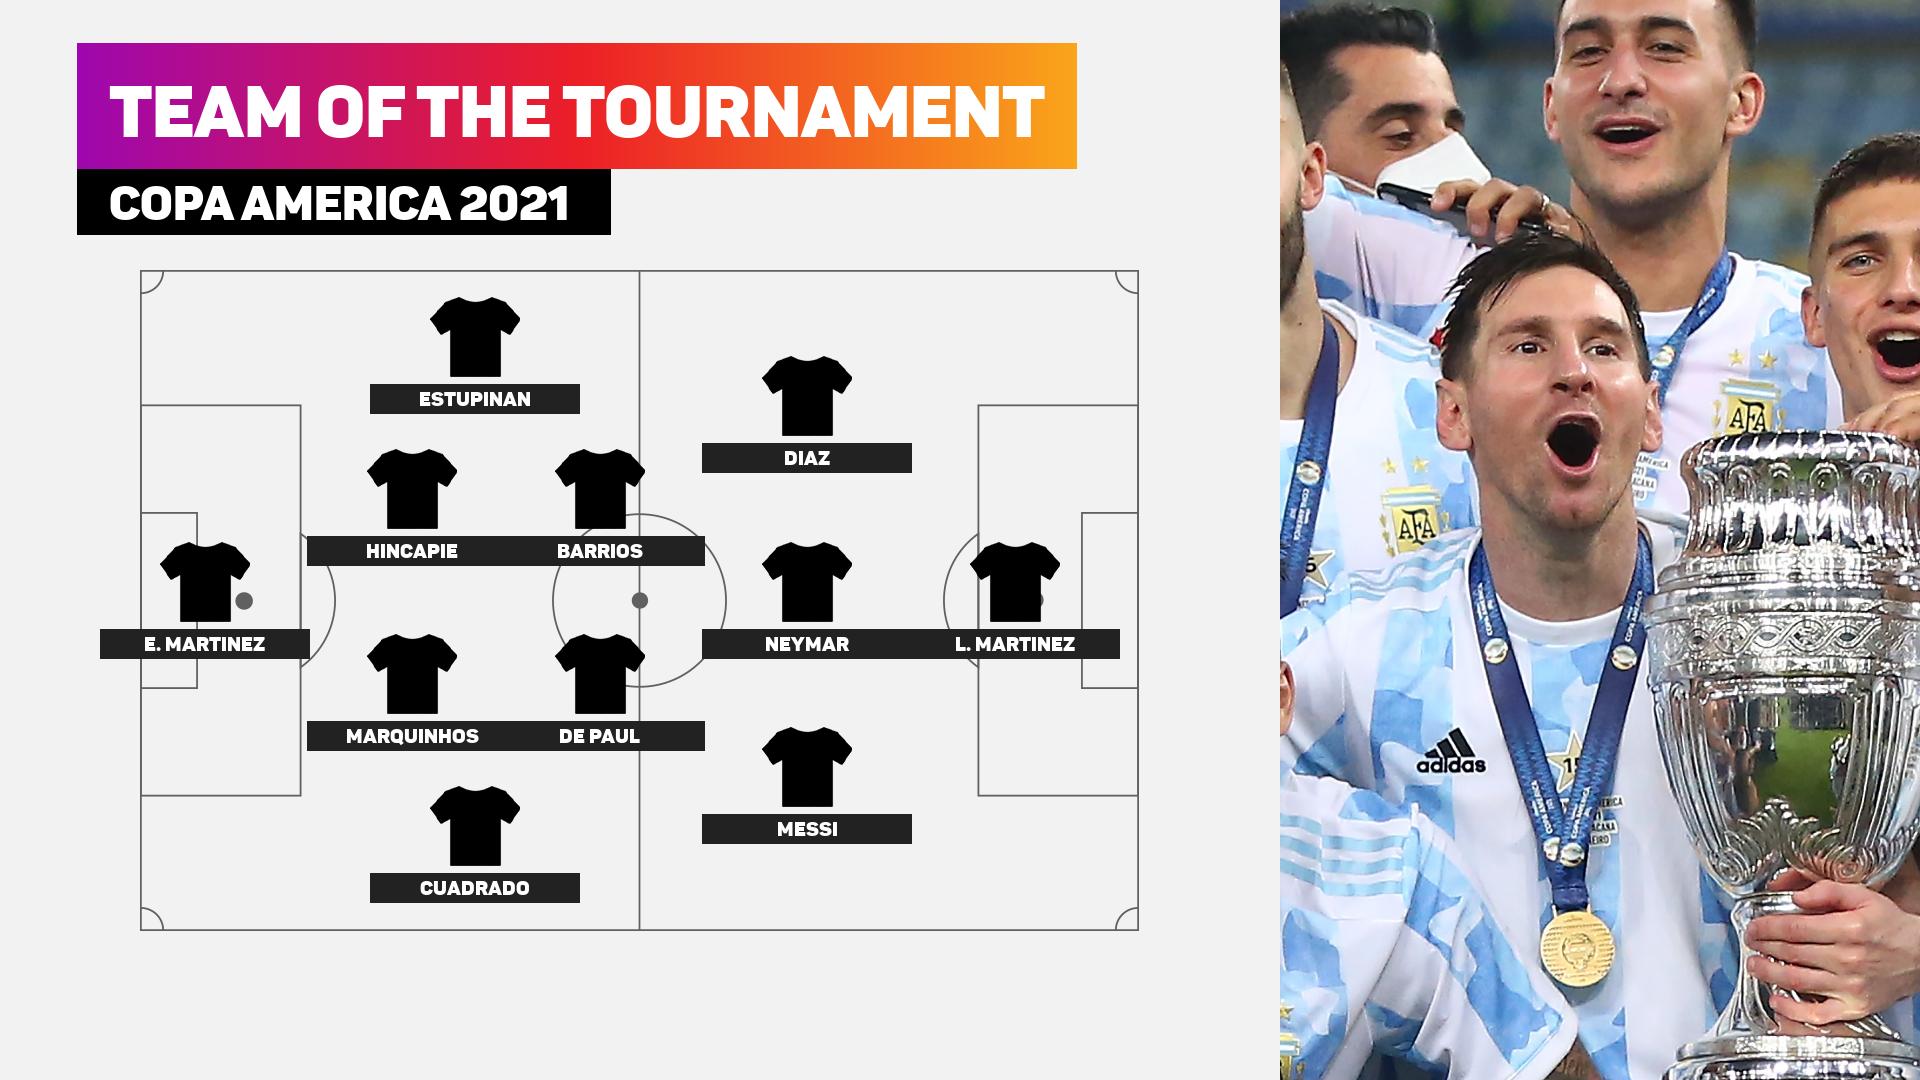 Copa America Team of the Tournament